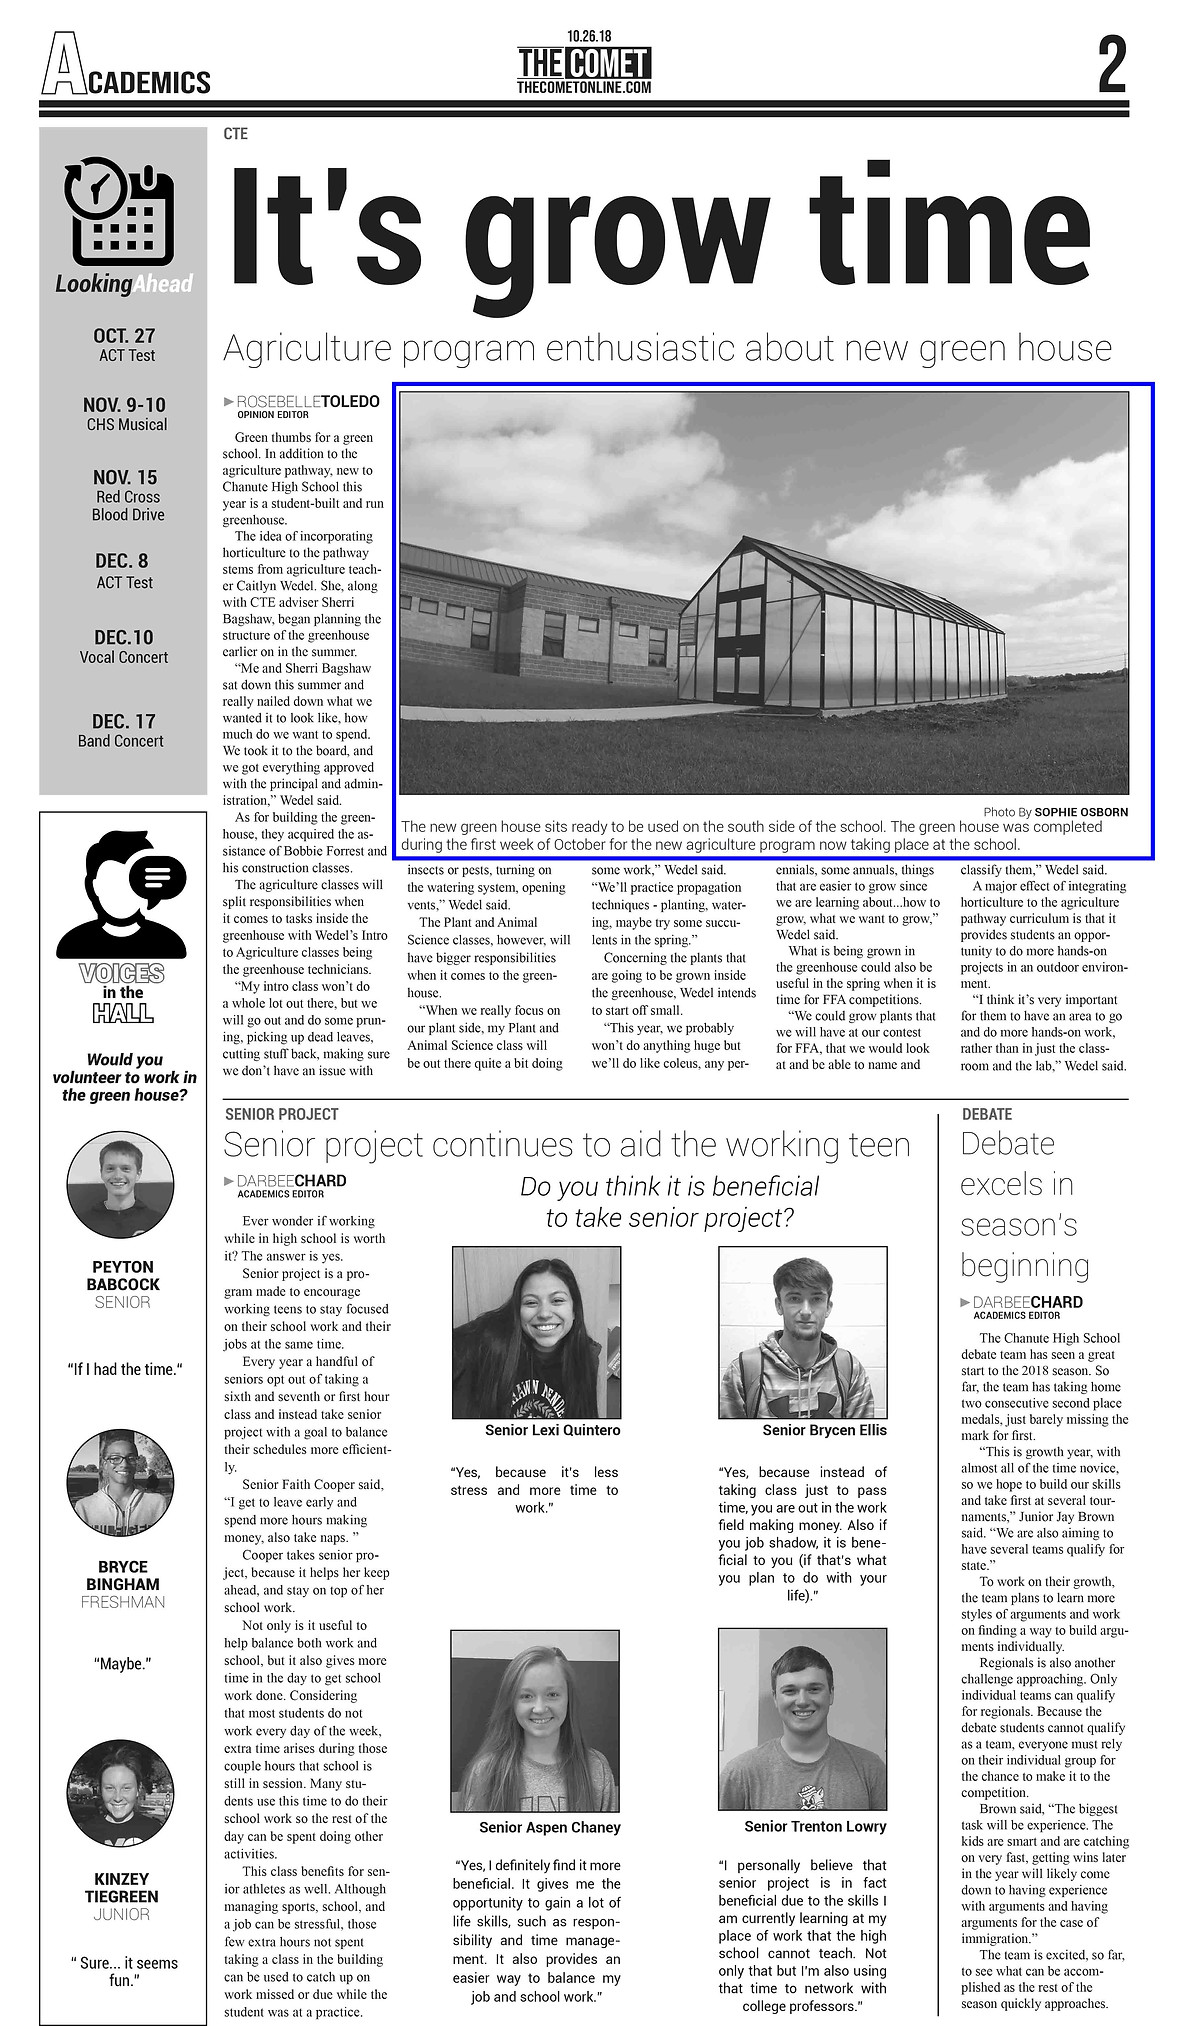 10-26-2018 Page 2-JPEG.jpg